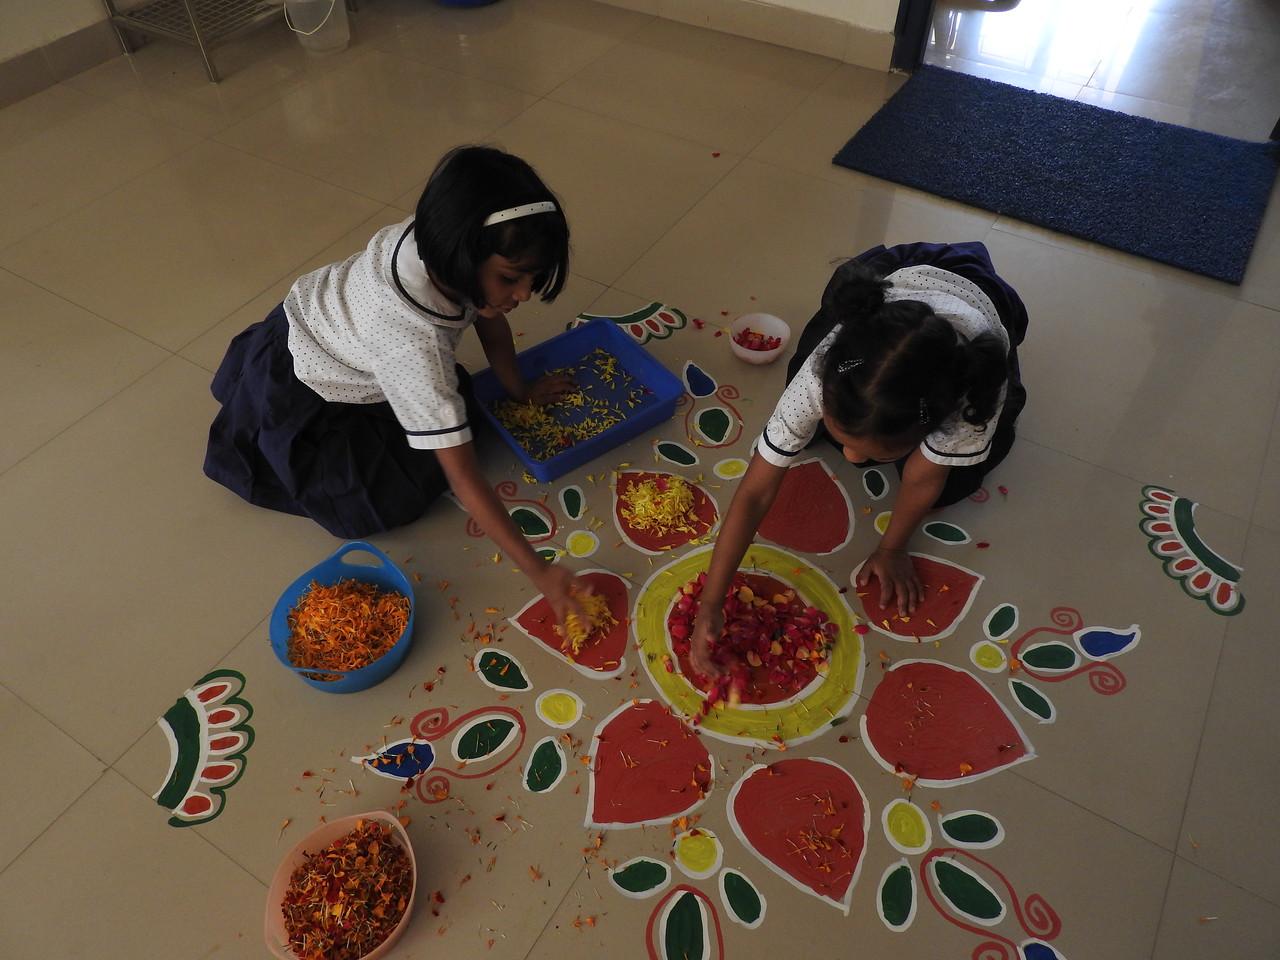 MAKING RANGOLI WITH FLOWER PETALS